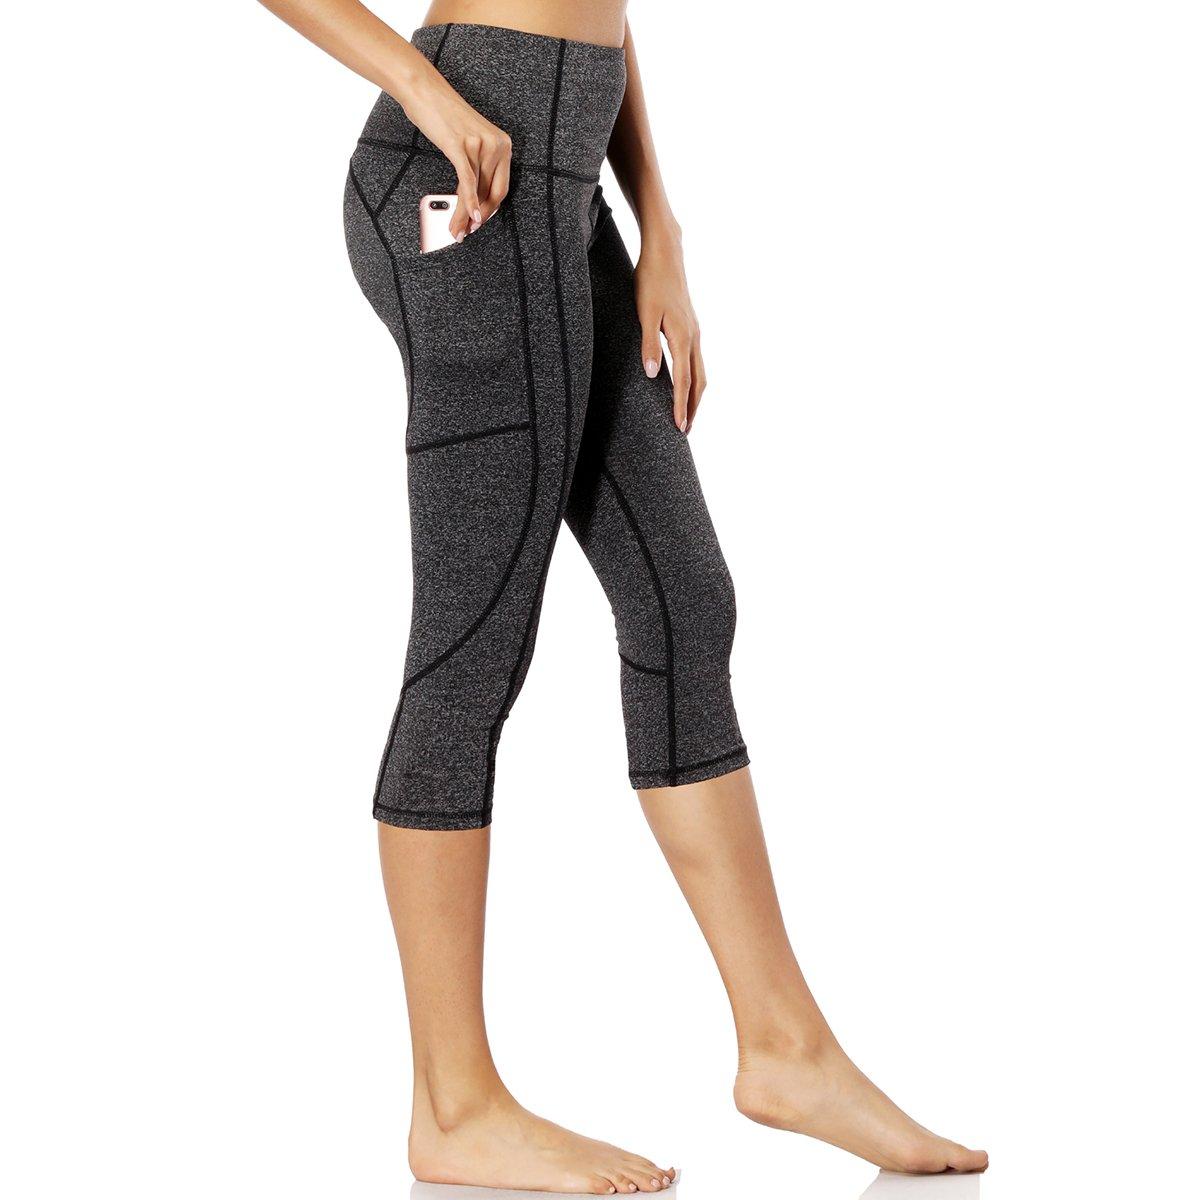 d8e54dd80d3069 Standard US Size: XS fits 0-2, S fits 4-6, M fits 8-10, L fits 12-14. Four  way stretch spandex fabric, high-performance moisture wicking, ...